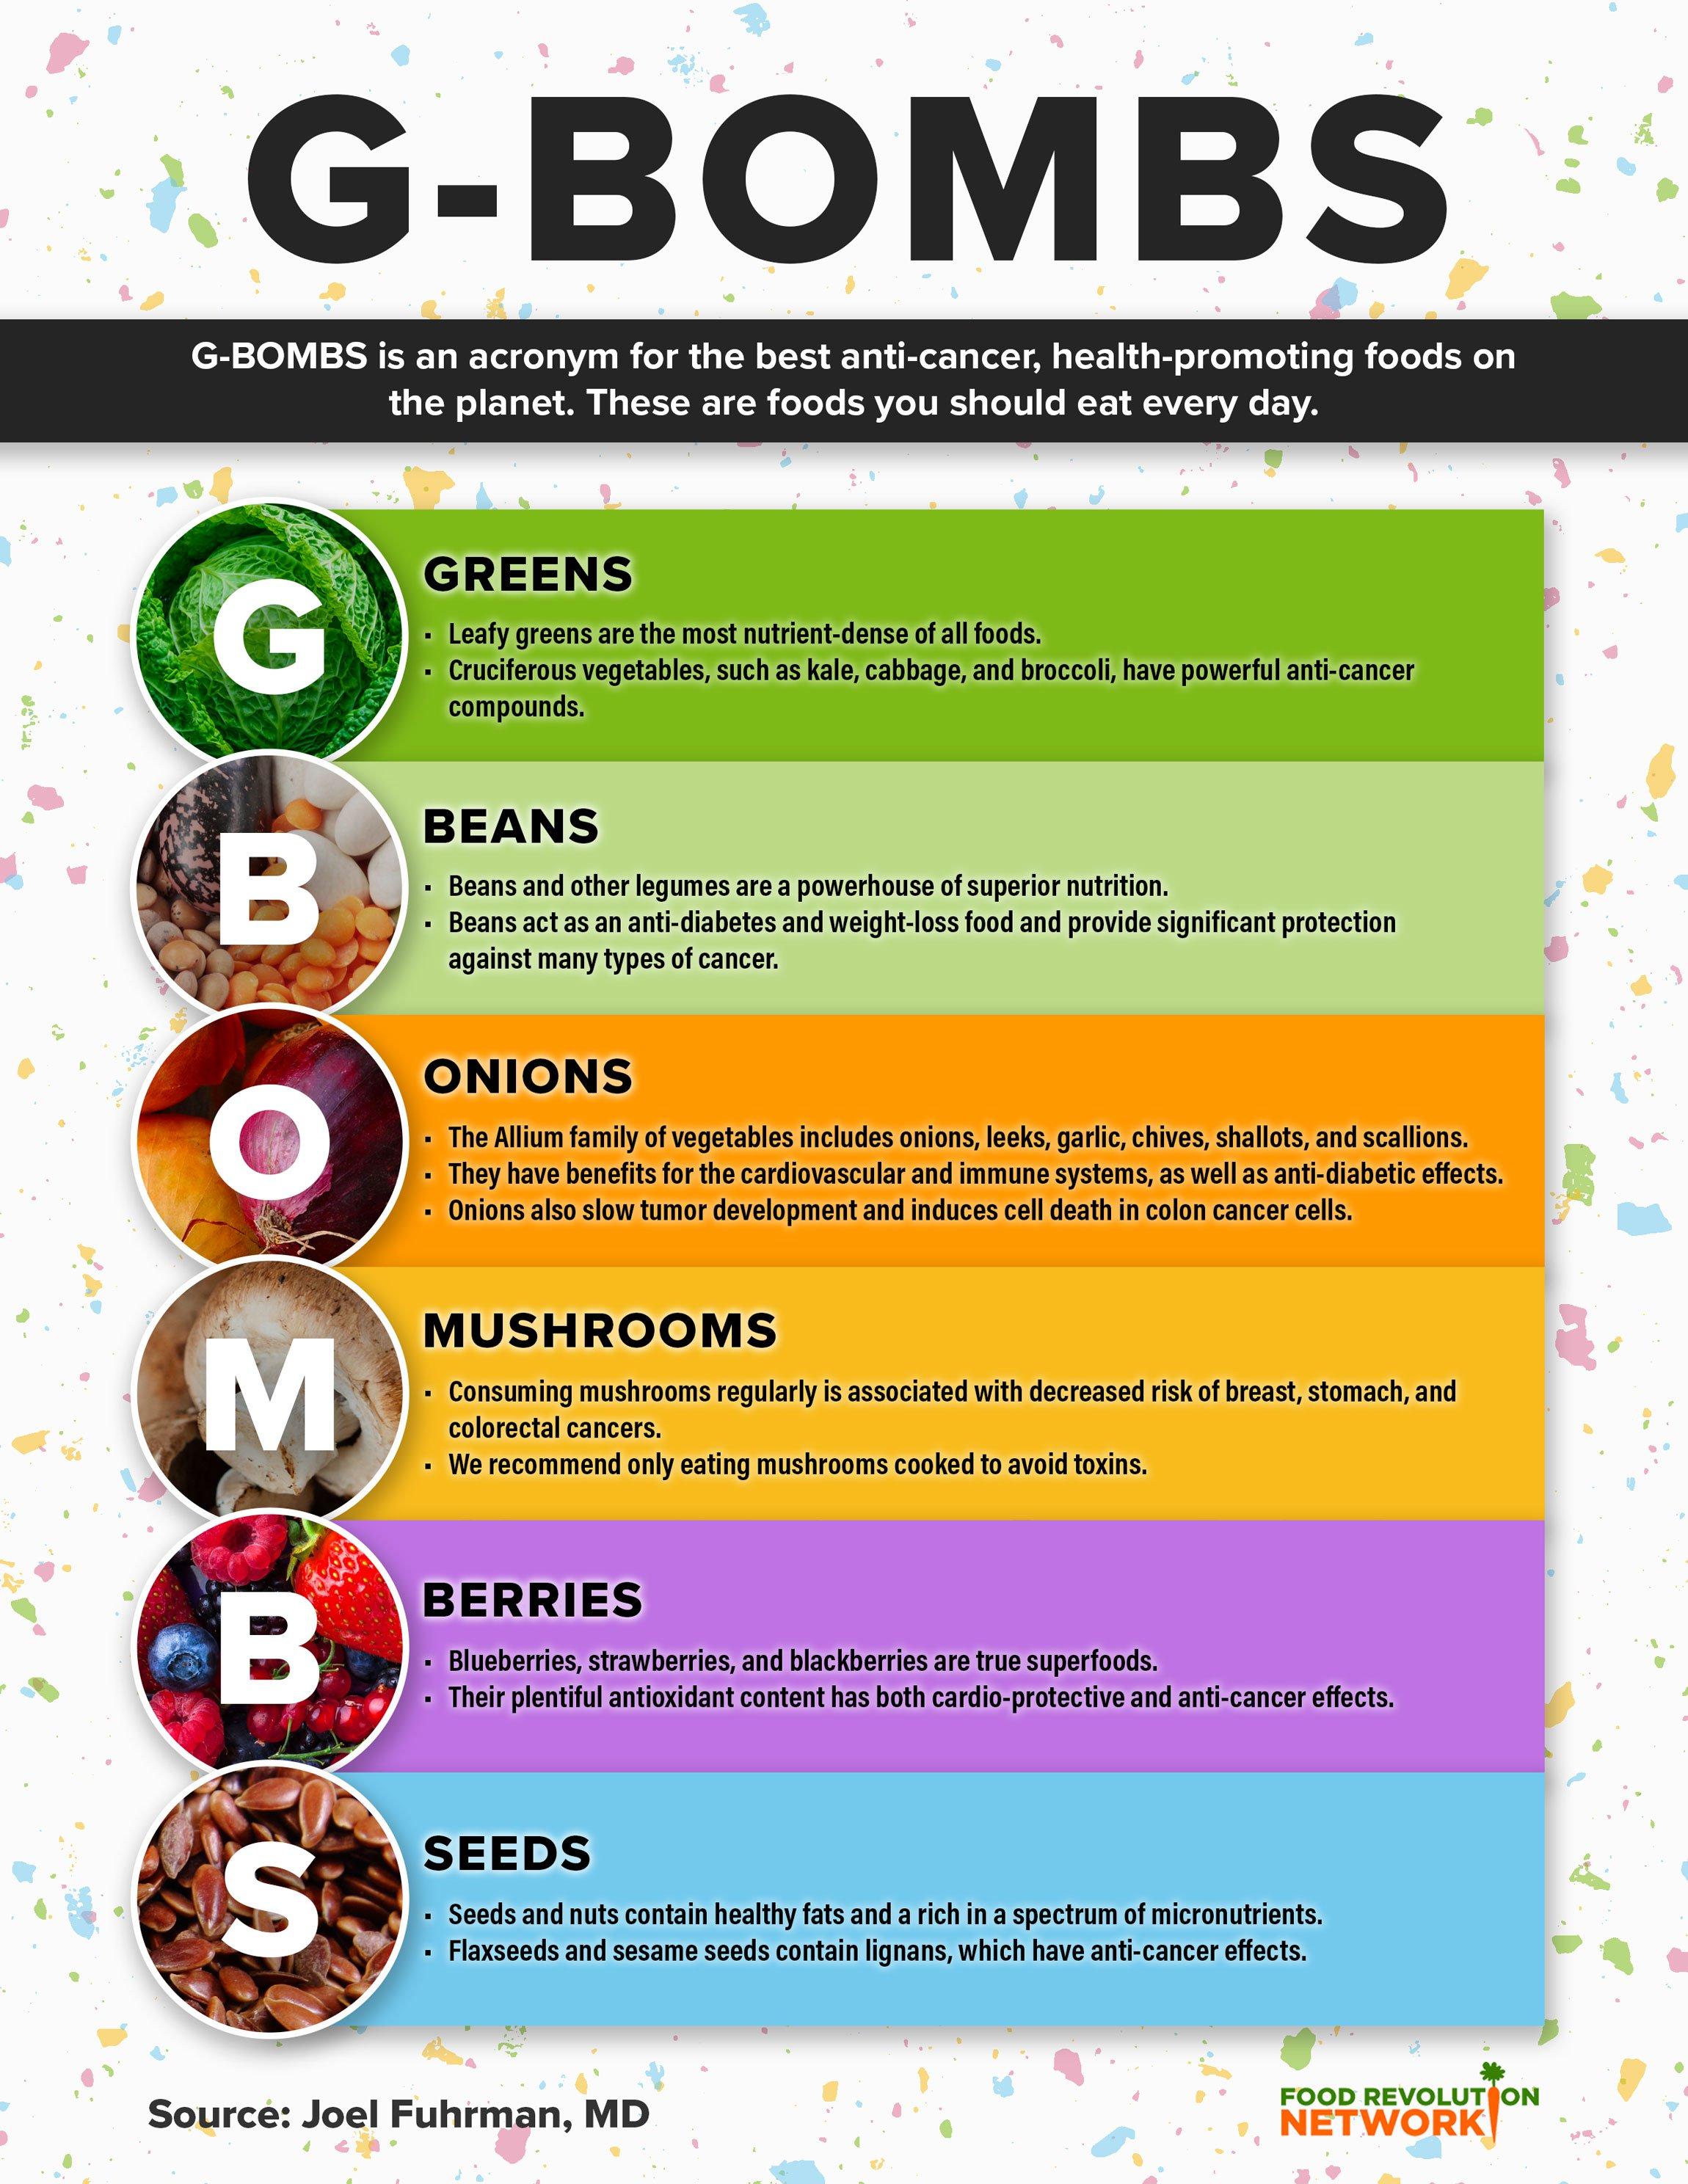 Infographic source:  https://foodrevolution.org/